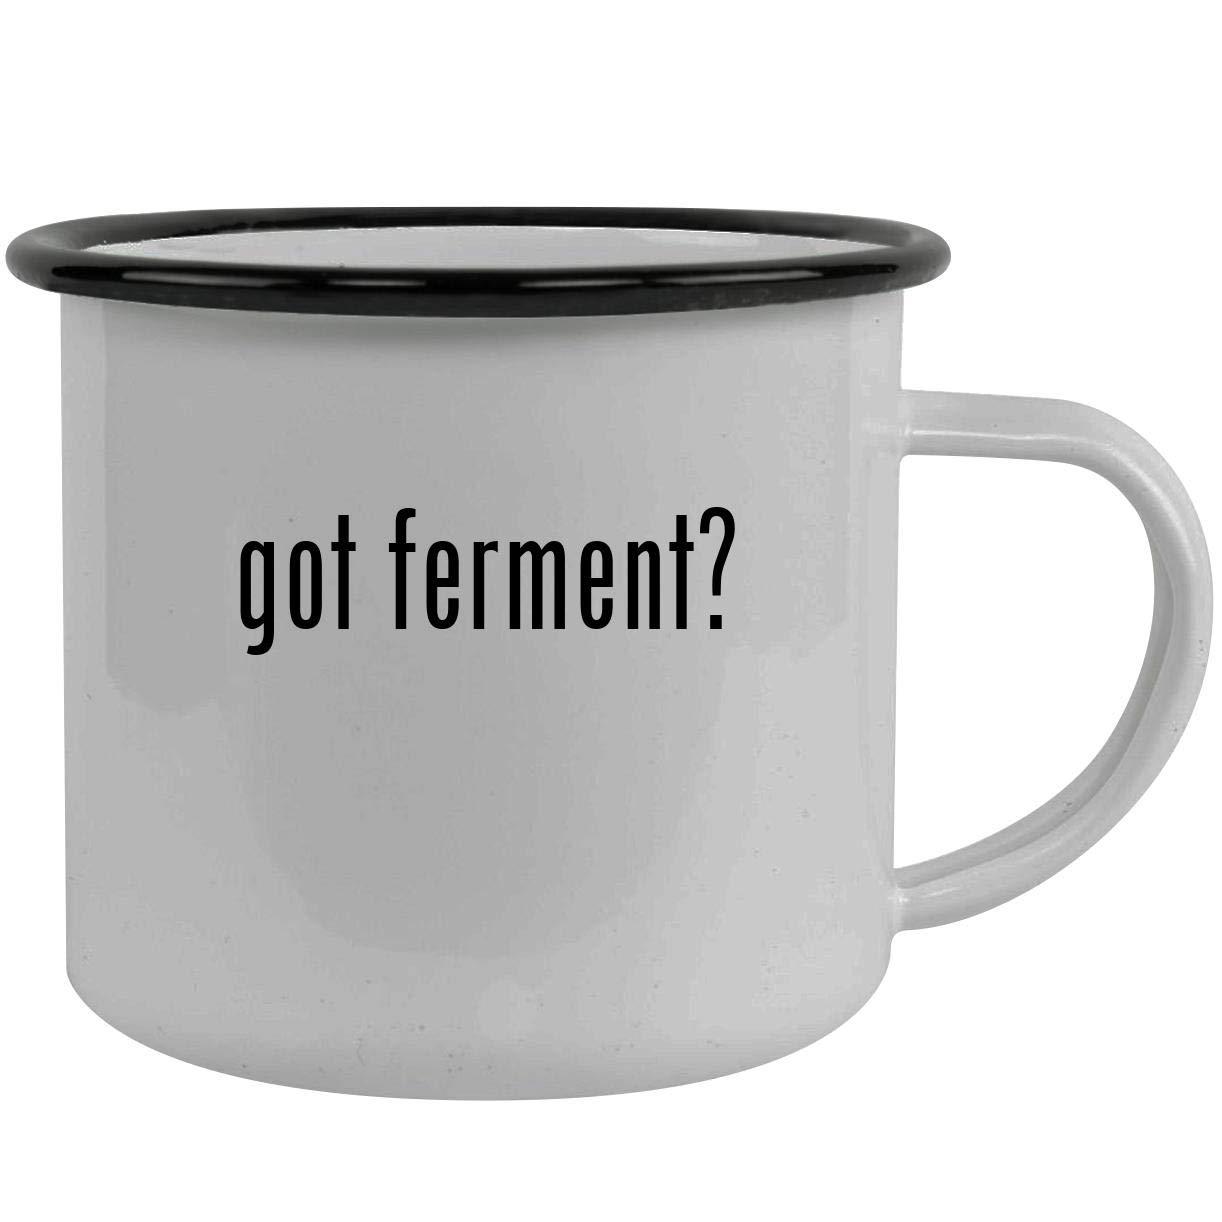 got ferment? - Stainless Steel 12oz Camping Mug, Black